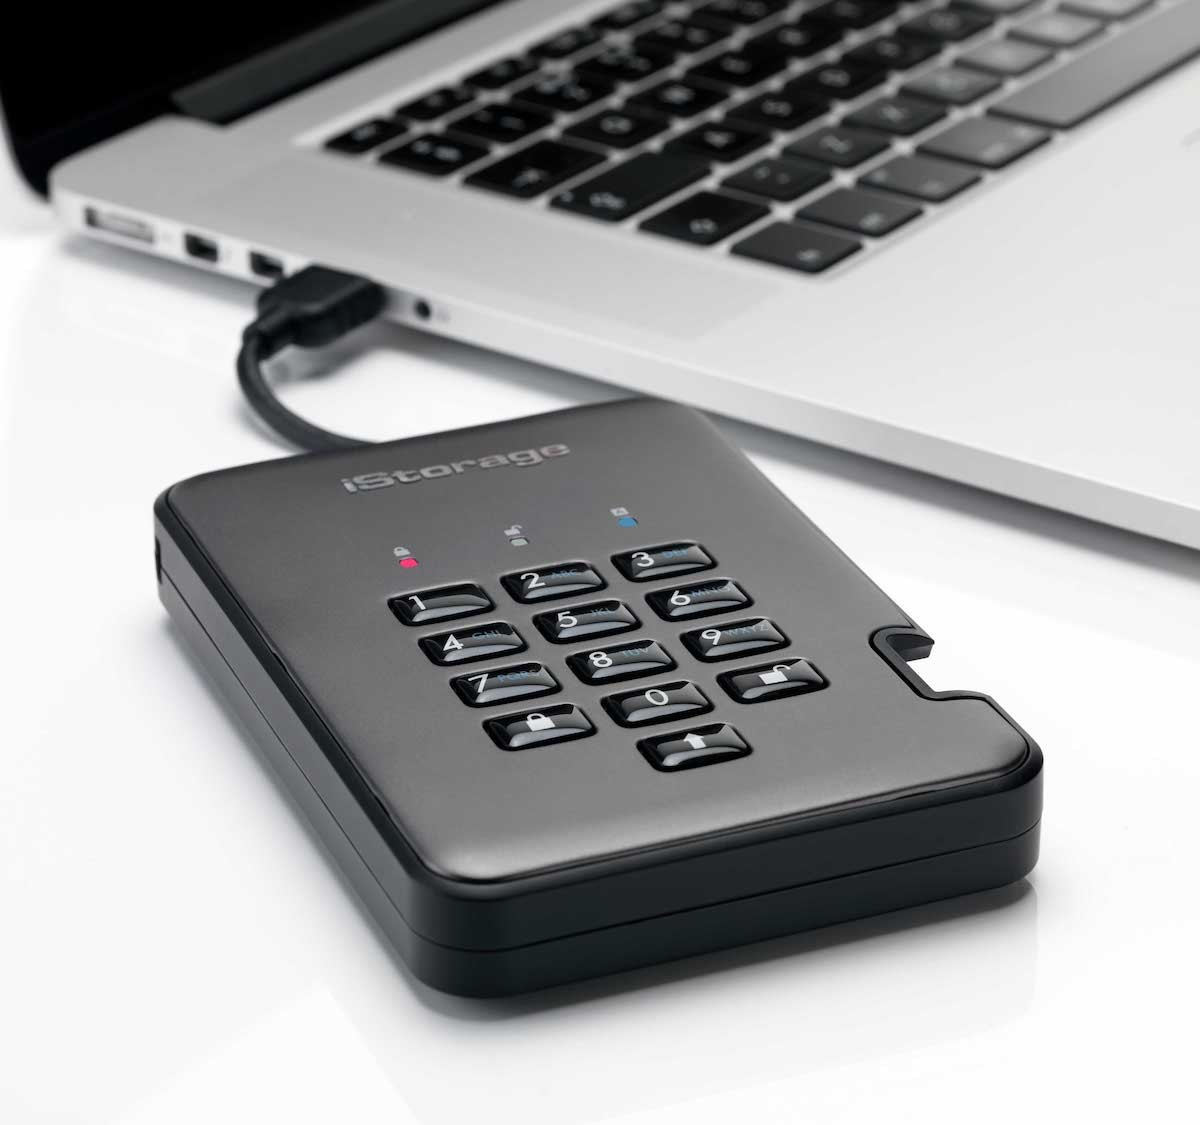 iStorage diskAshur PRO2 Secure Hard Drive unlocks with a unique PIN